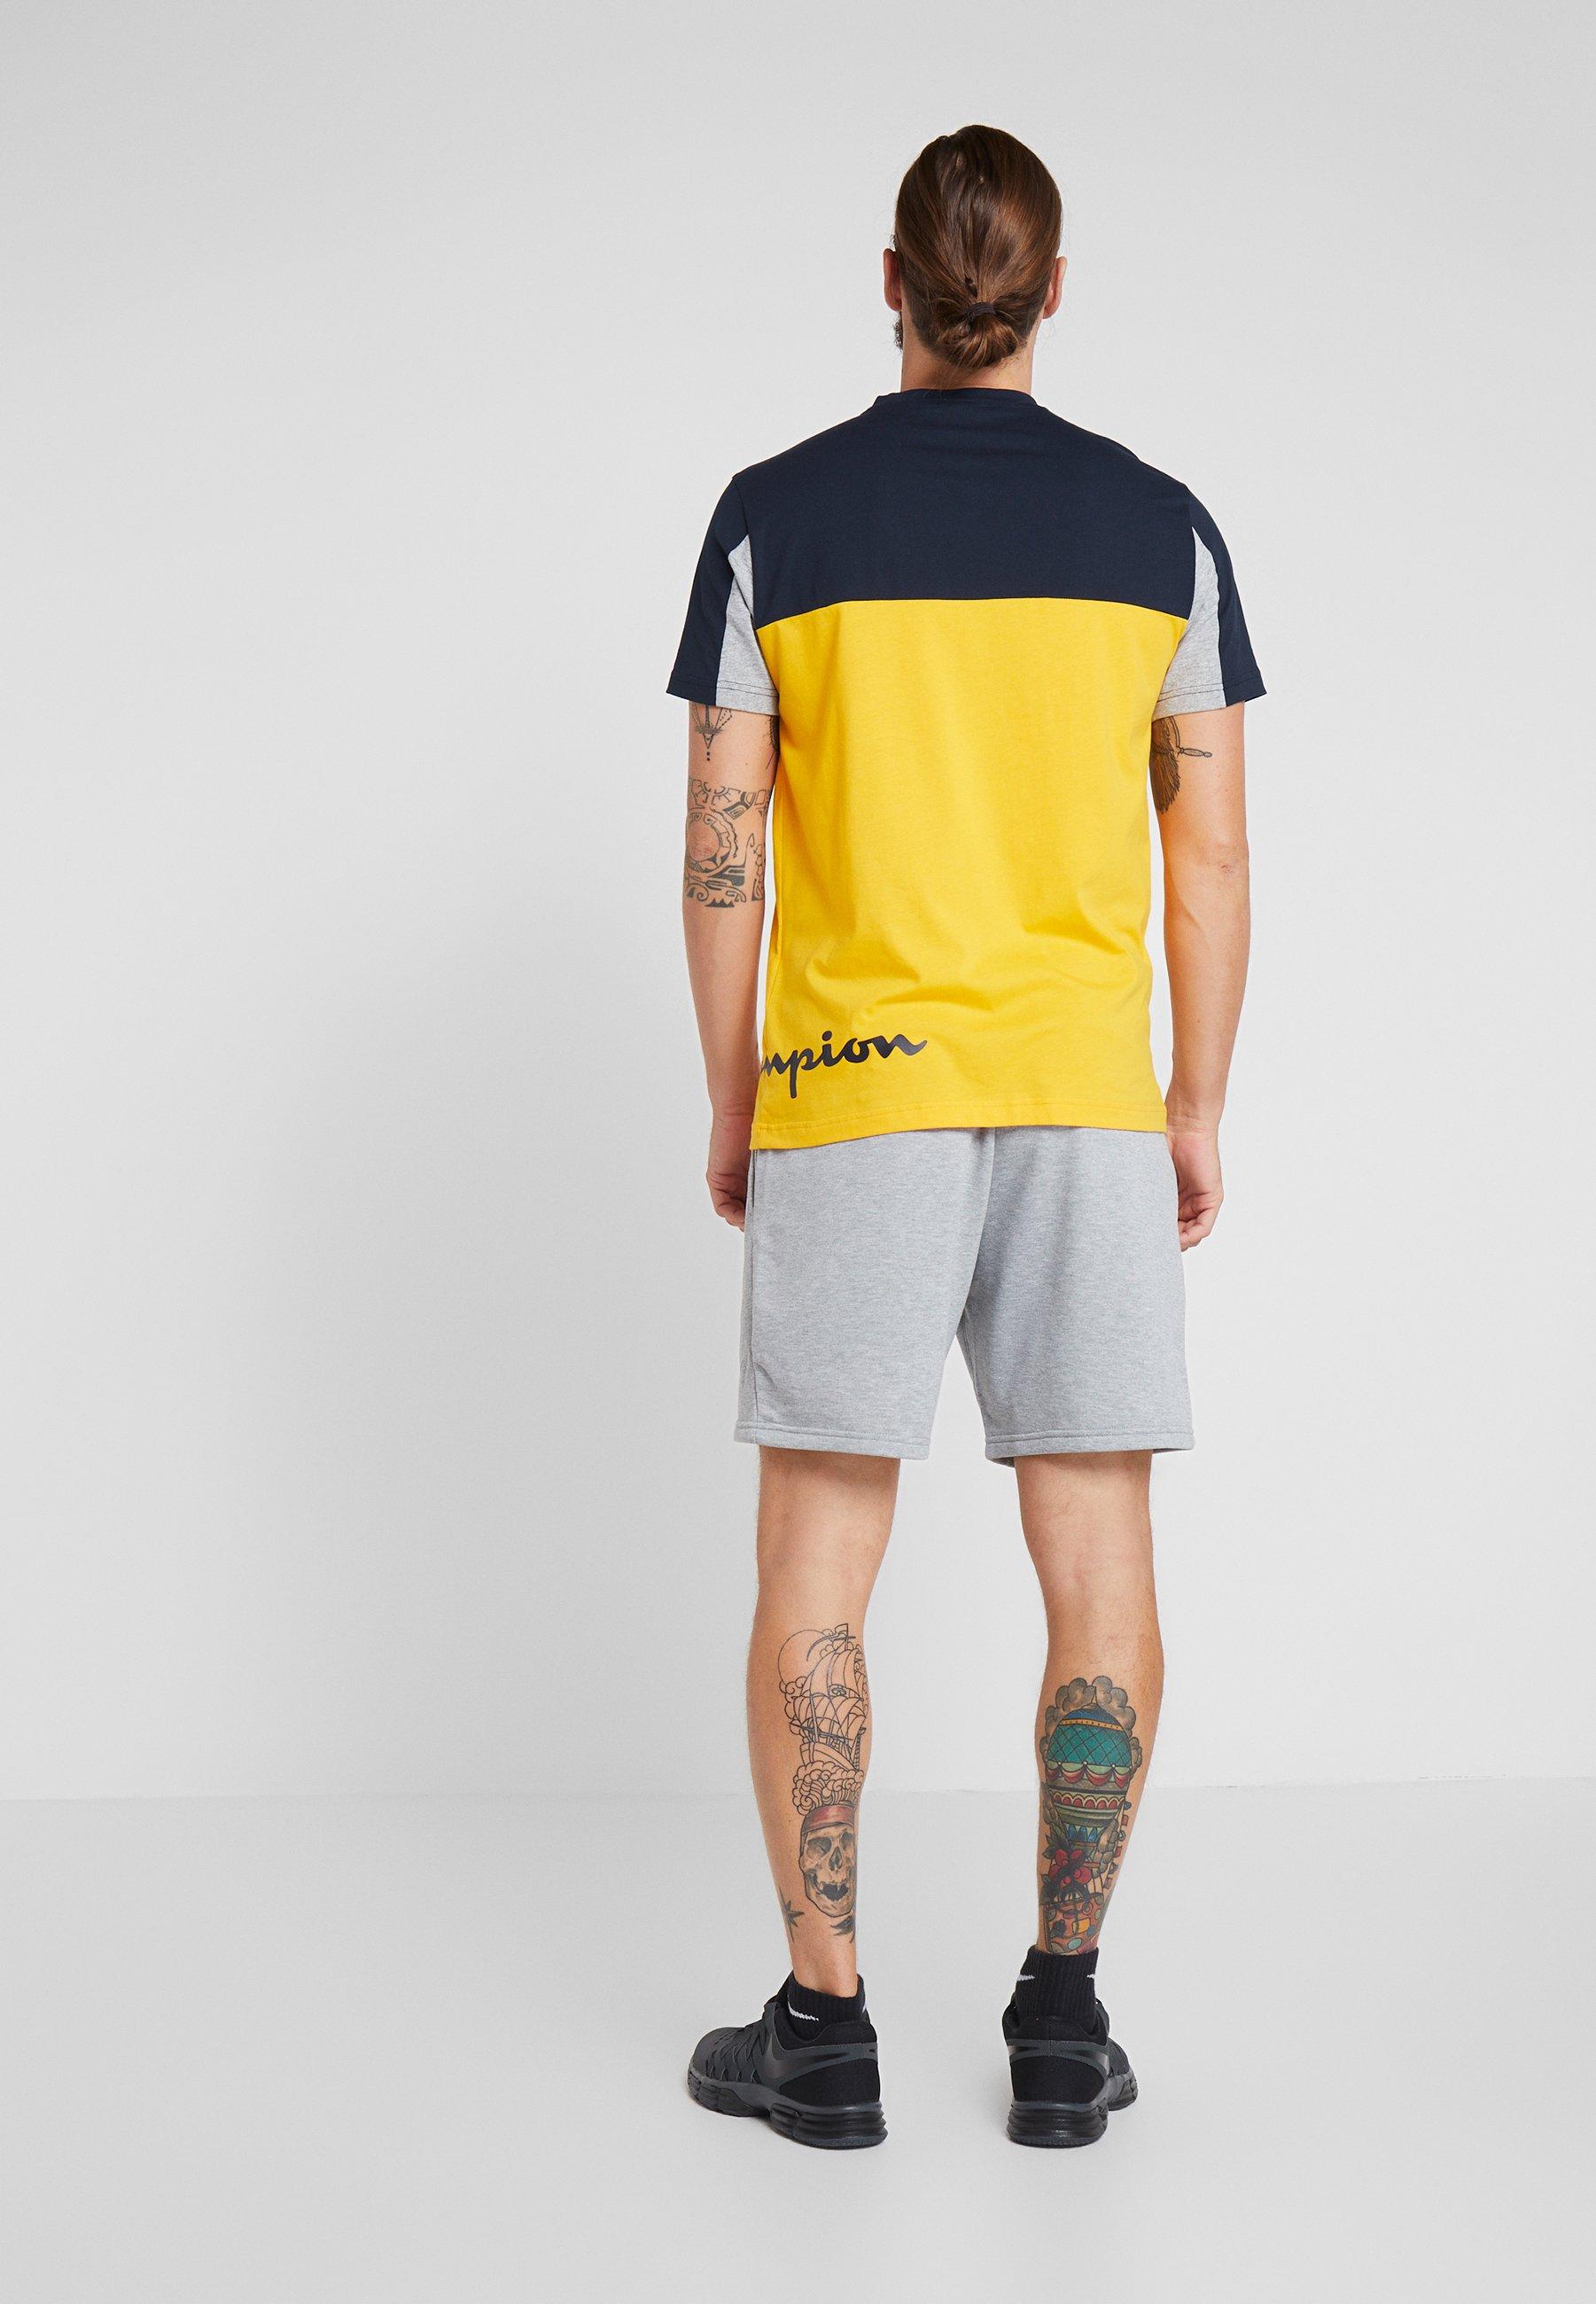 shirt Yellow CrewneckT Champion Champion CrewneckT Imprimé nON0wmv8